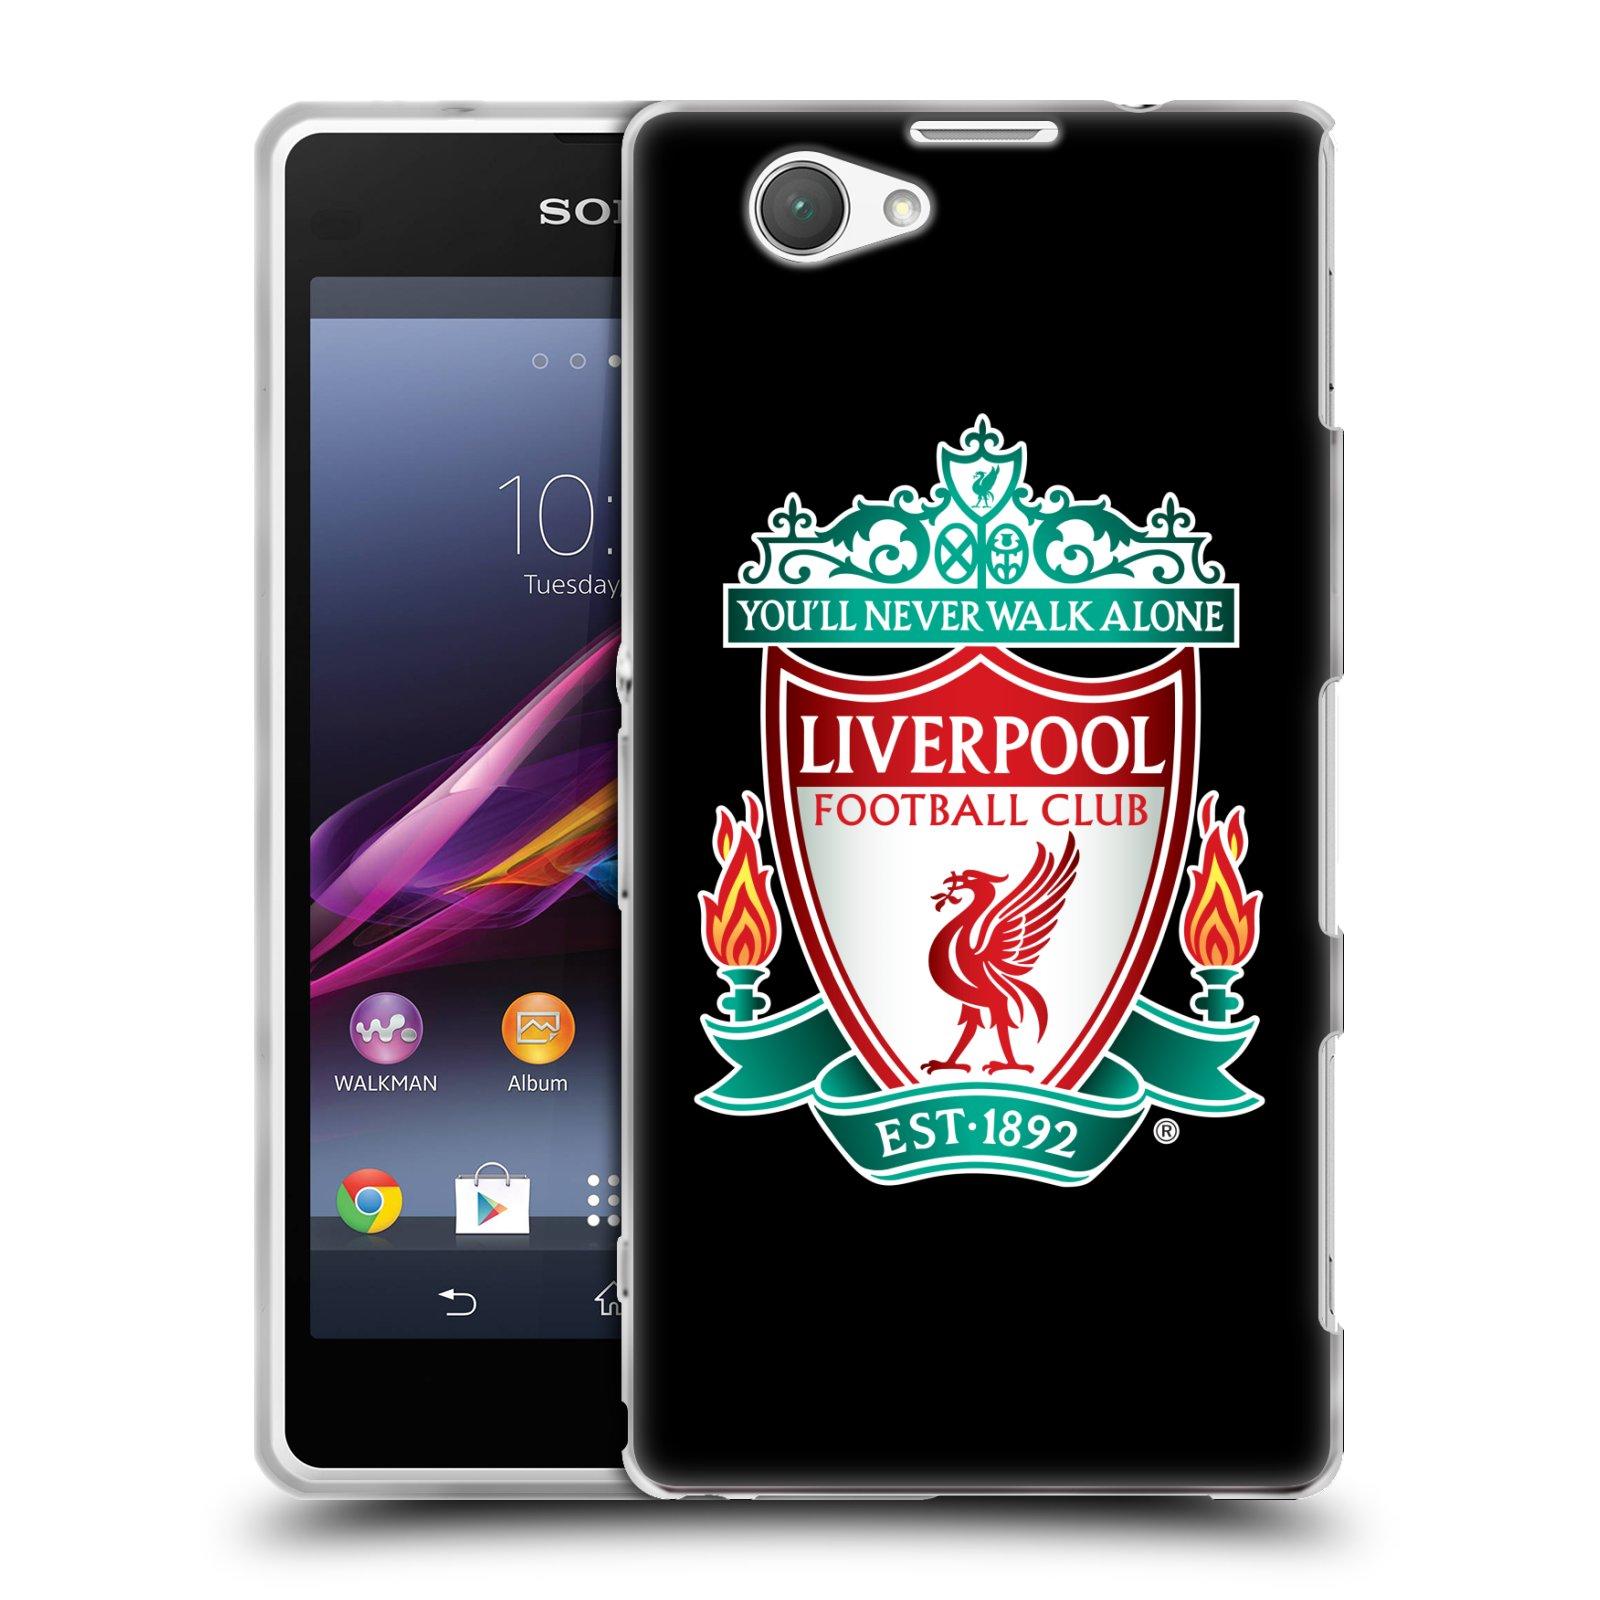 Silikonové pouzdro na mobil Sony Xperia Z1 Compact D5503 HEAD CASE ZNAK LIVERPOOL FC OFFICIAL BLACK (Silikonový kryt či obal na mobilní telefon Liverpool FC Official pro Sony Xperia Z1 Compact)